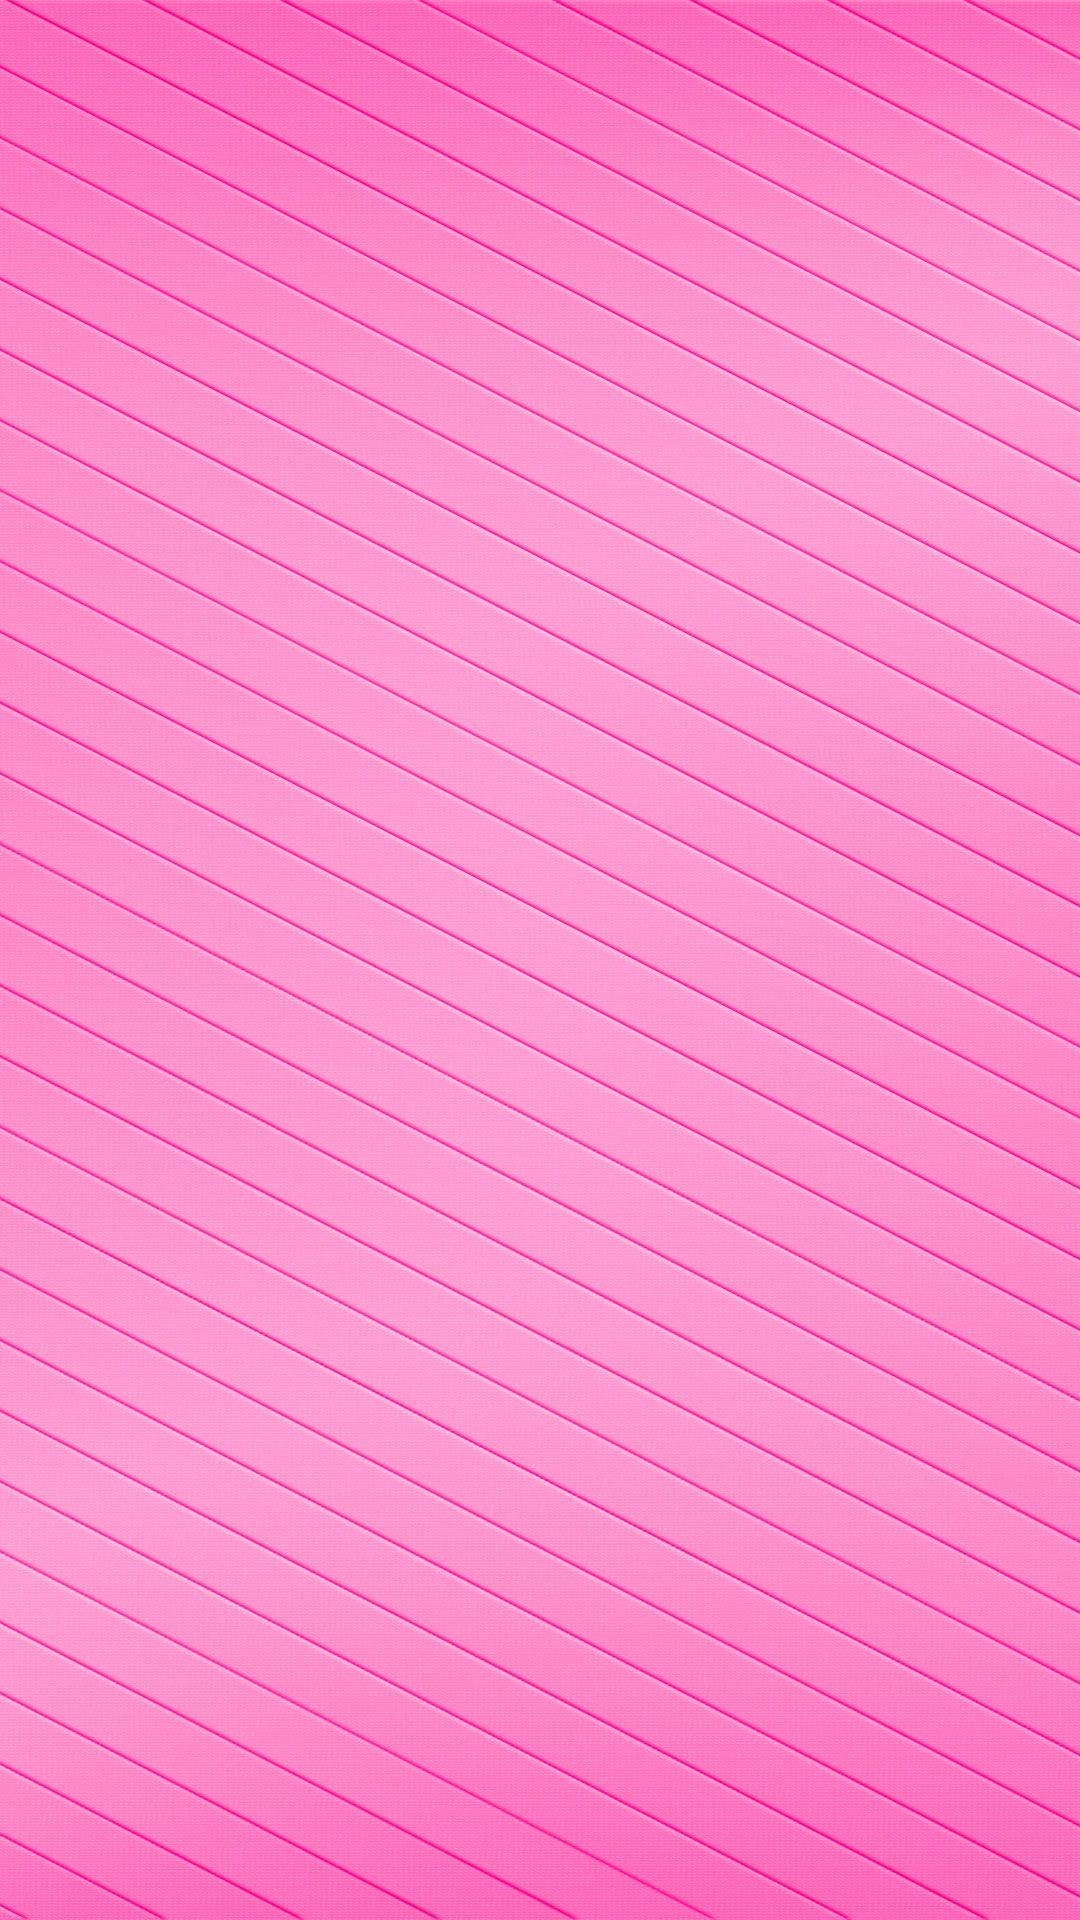 Cute Pink Simple Smartphone Wallpaper Pink Wallpaper